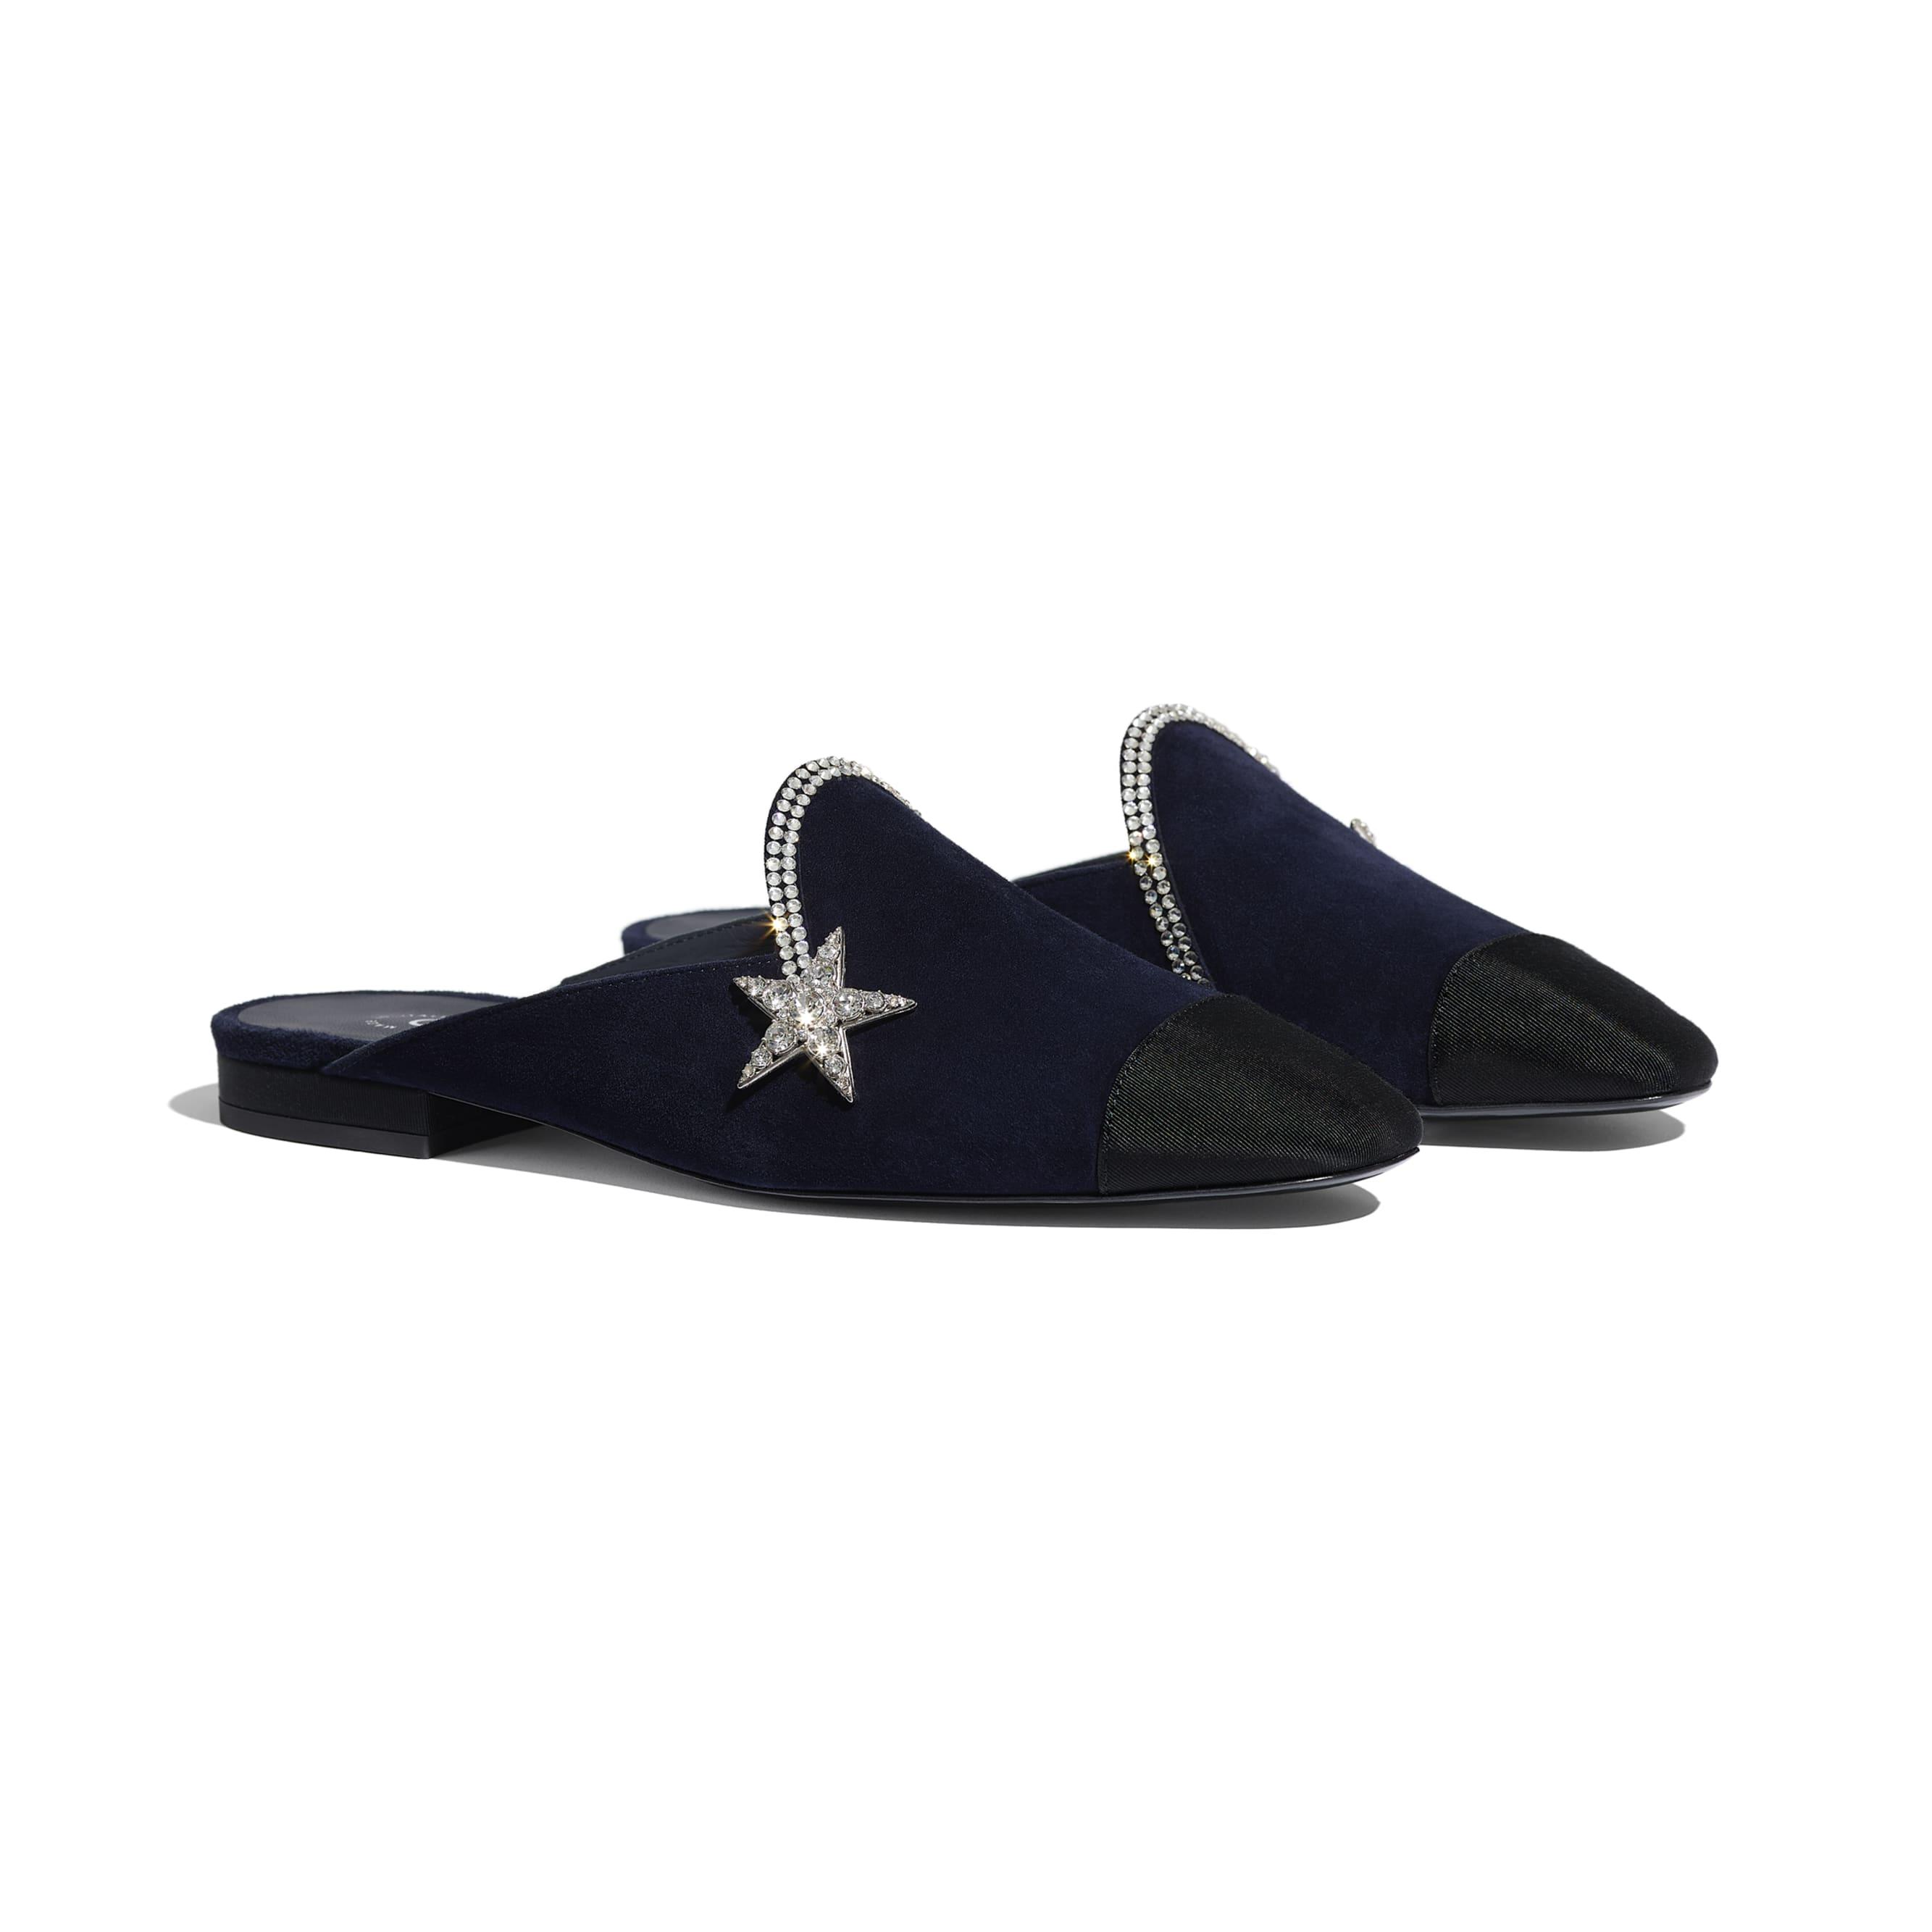 Mules - Navy Blue & Black - Suede Calfskin & Grosgrain - CHANEL - Alternative view - see standard sized version